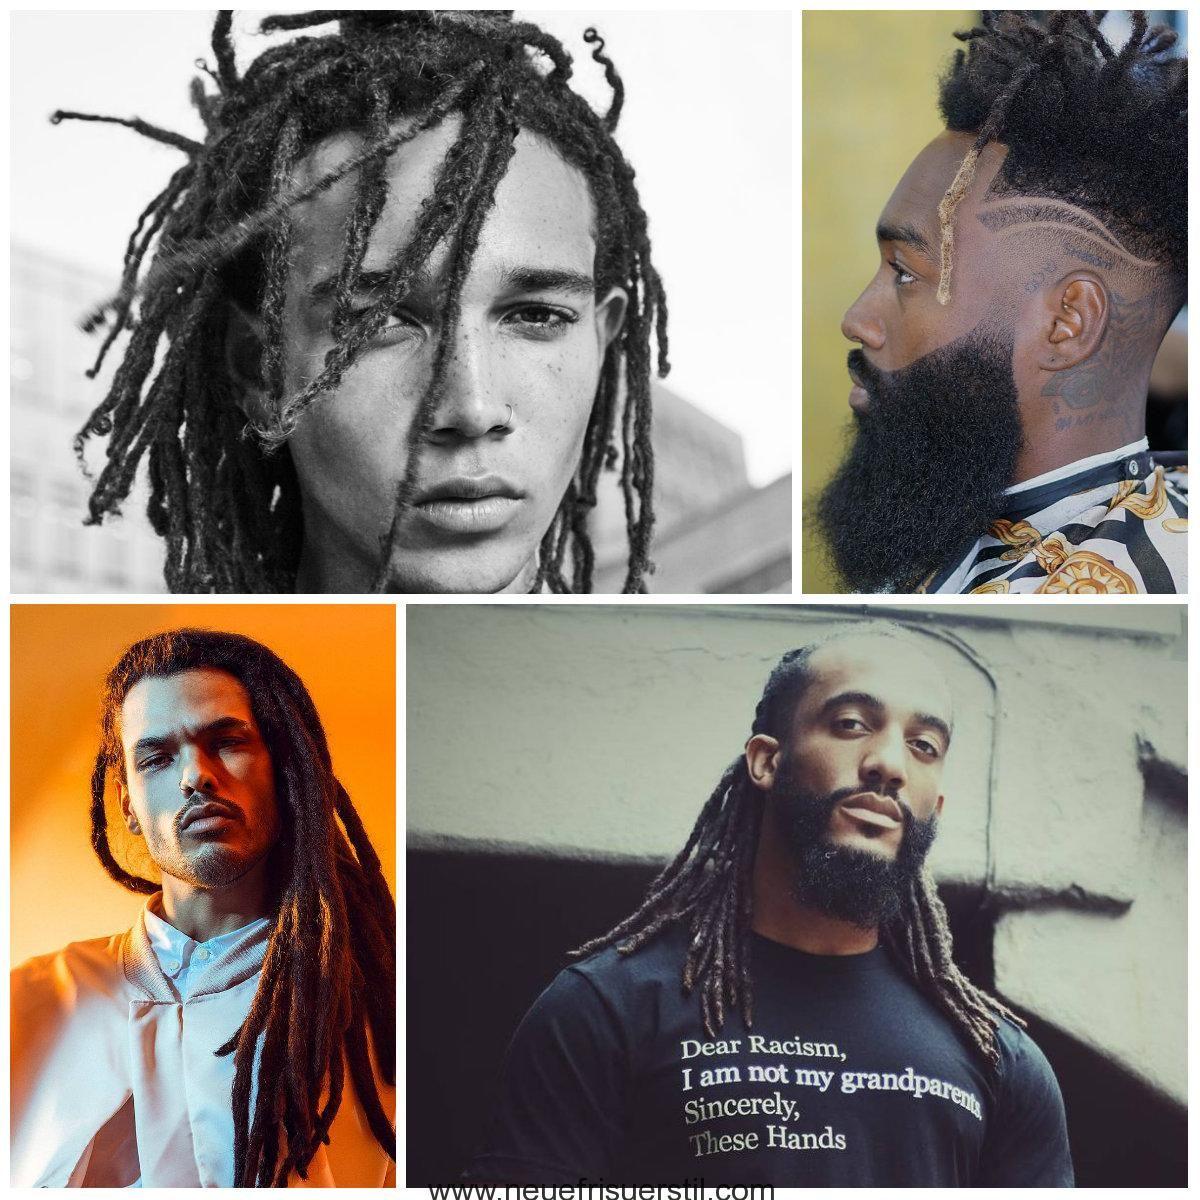 dreadlocks hairstyles for men in 2018